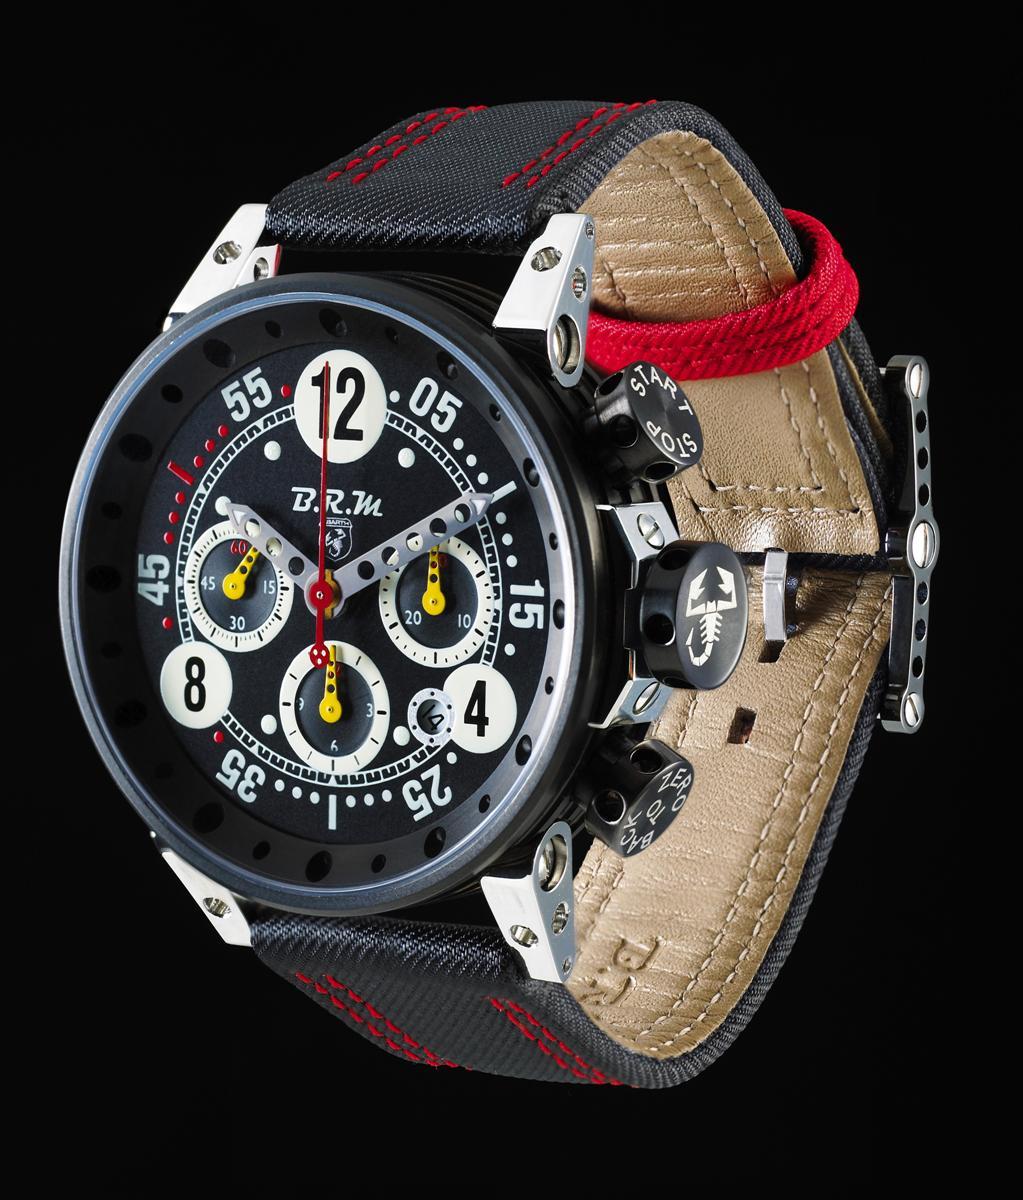 Abarth BRM V12-T-44 Watch Precedes Abarth Fiat 500 U.S. Arrival